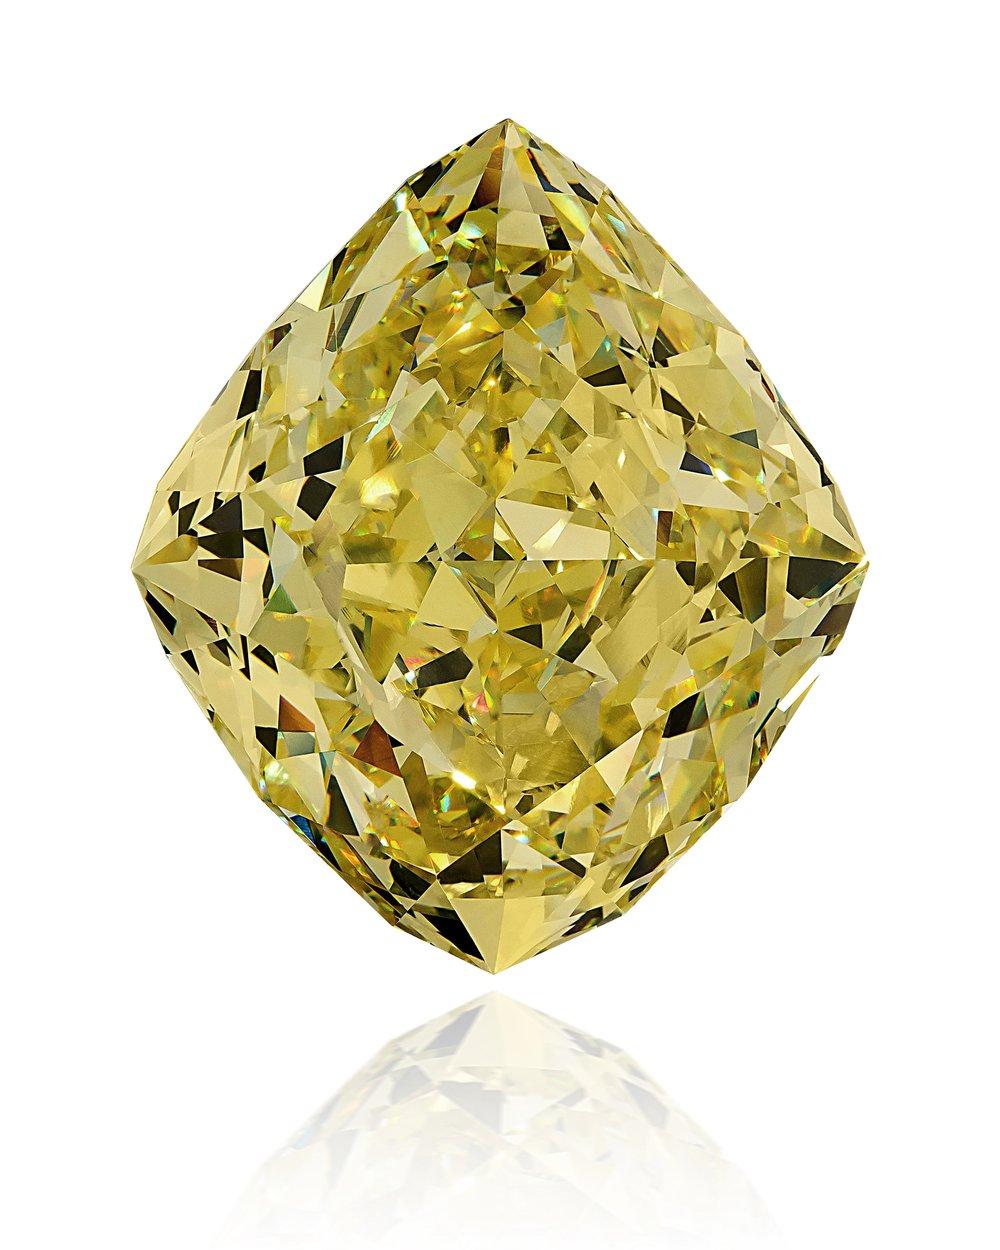 90.59ct Vivid Yellow Diamond white.jpg